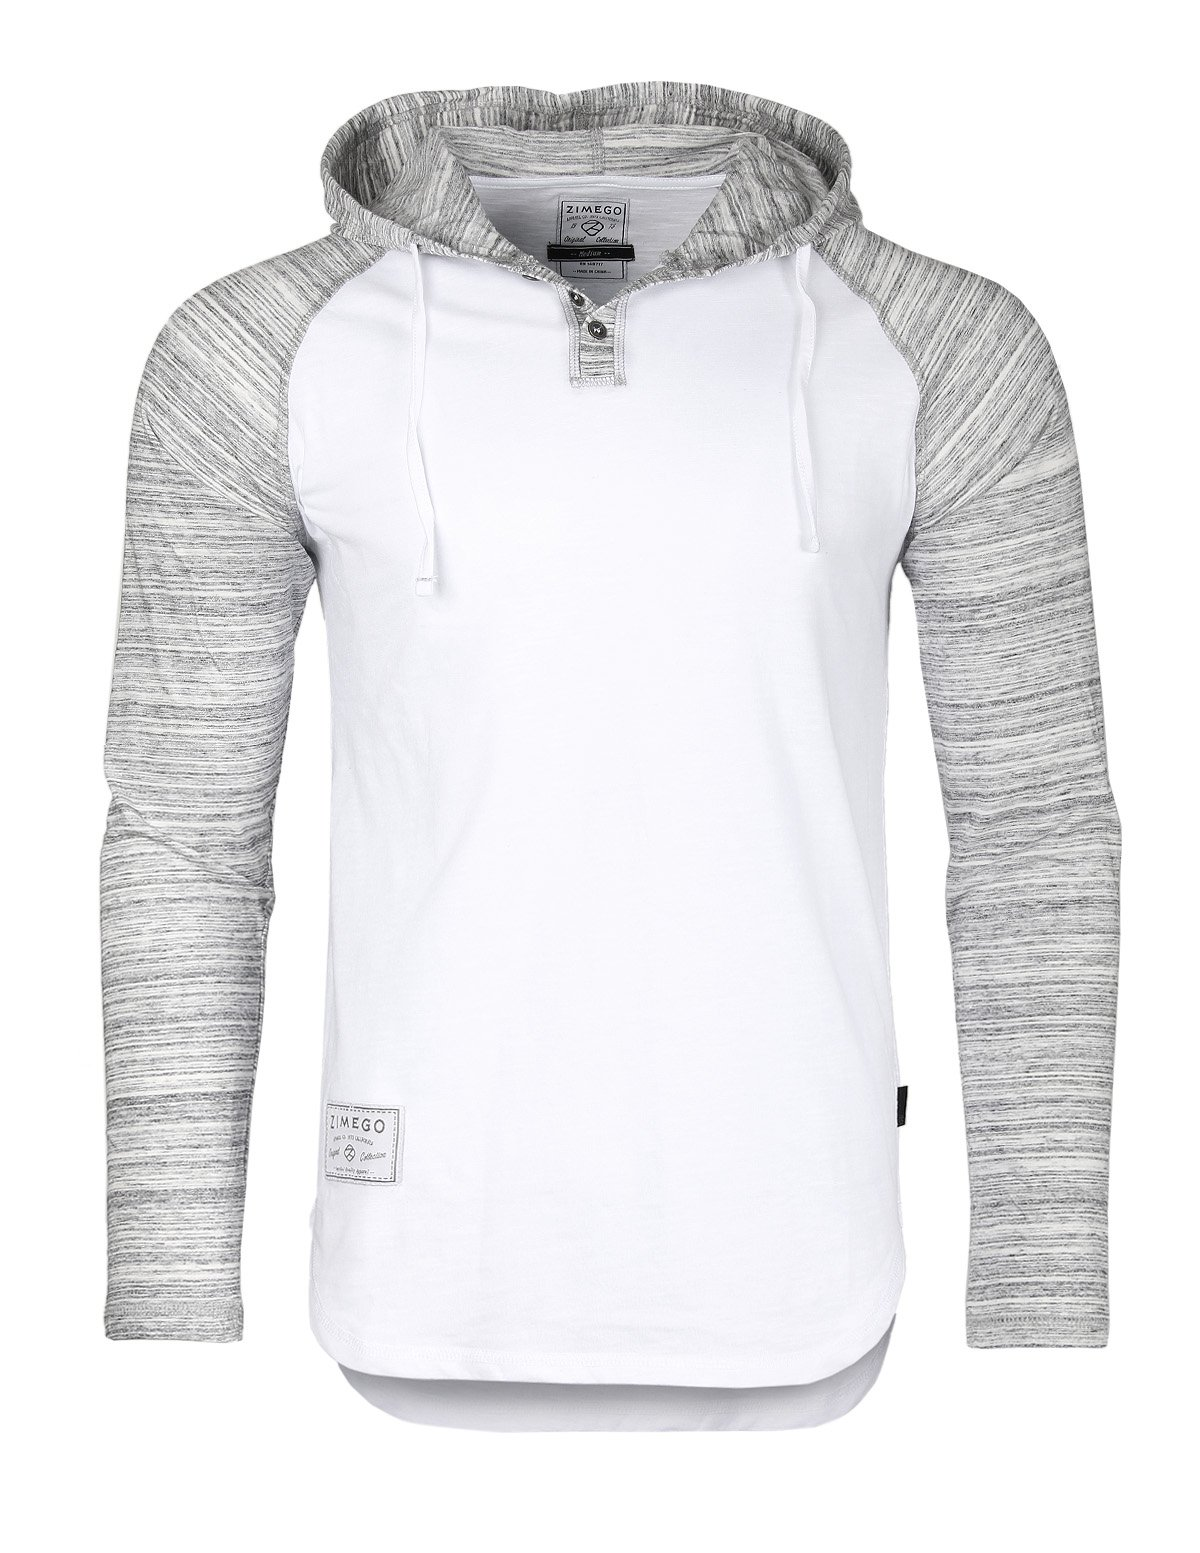 ZIMEGO Long Sleeve Raglan Henley Hoodie Round Bottom Semi Longline T-Shirt (Small, ZFLS140H White Fulfilled by Merchant)